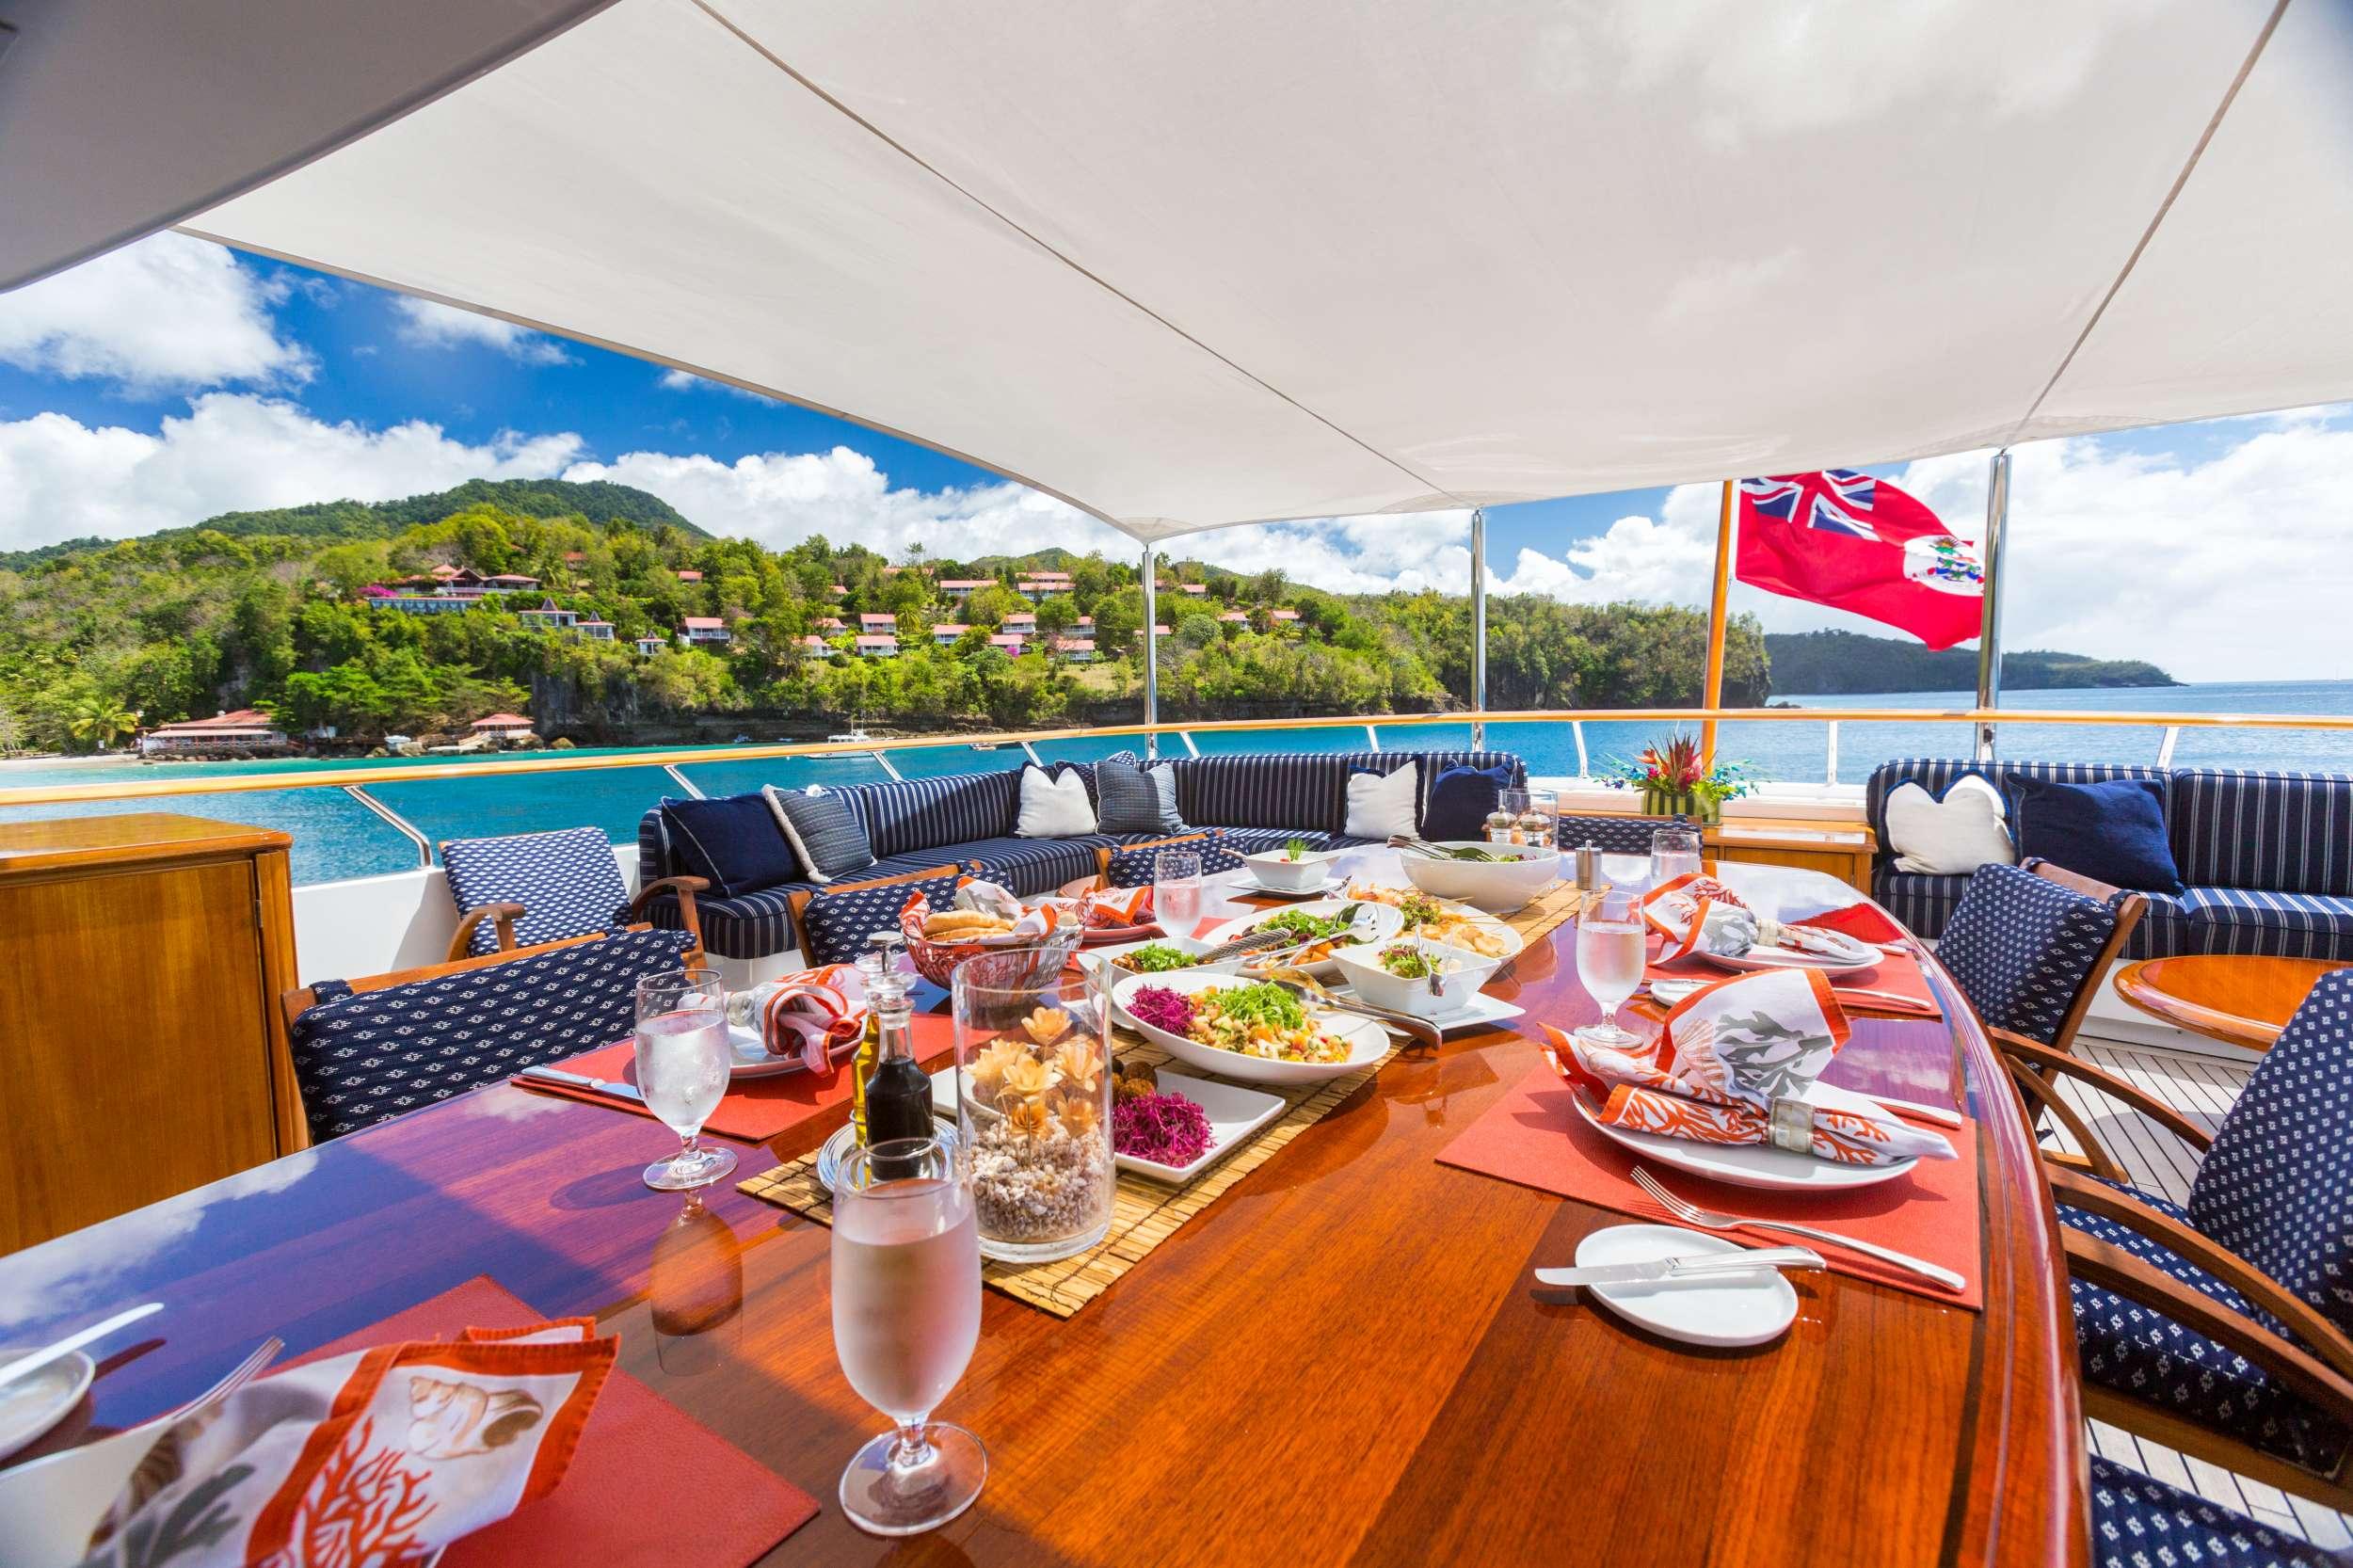 Motor Yacht 'LADY J' Bridge Deck Dining, 12 PAX, 9 Crew, 142.00 Ft, 43.00 Meters, Built 1997, Palmer Johnson, Refit Year 2017